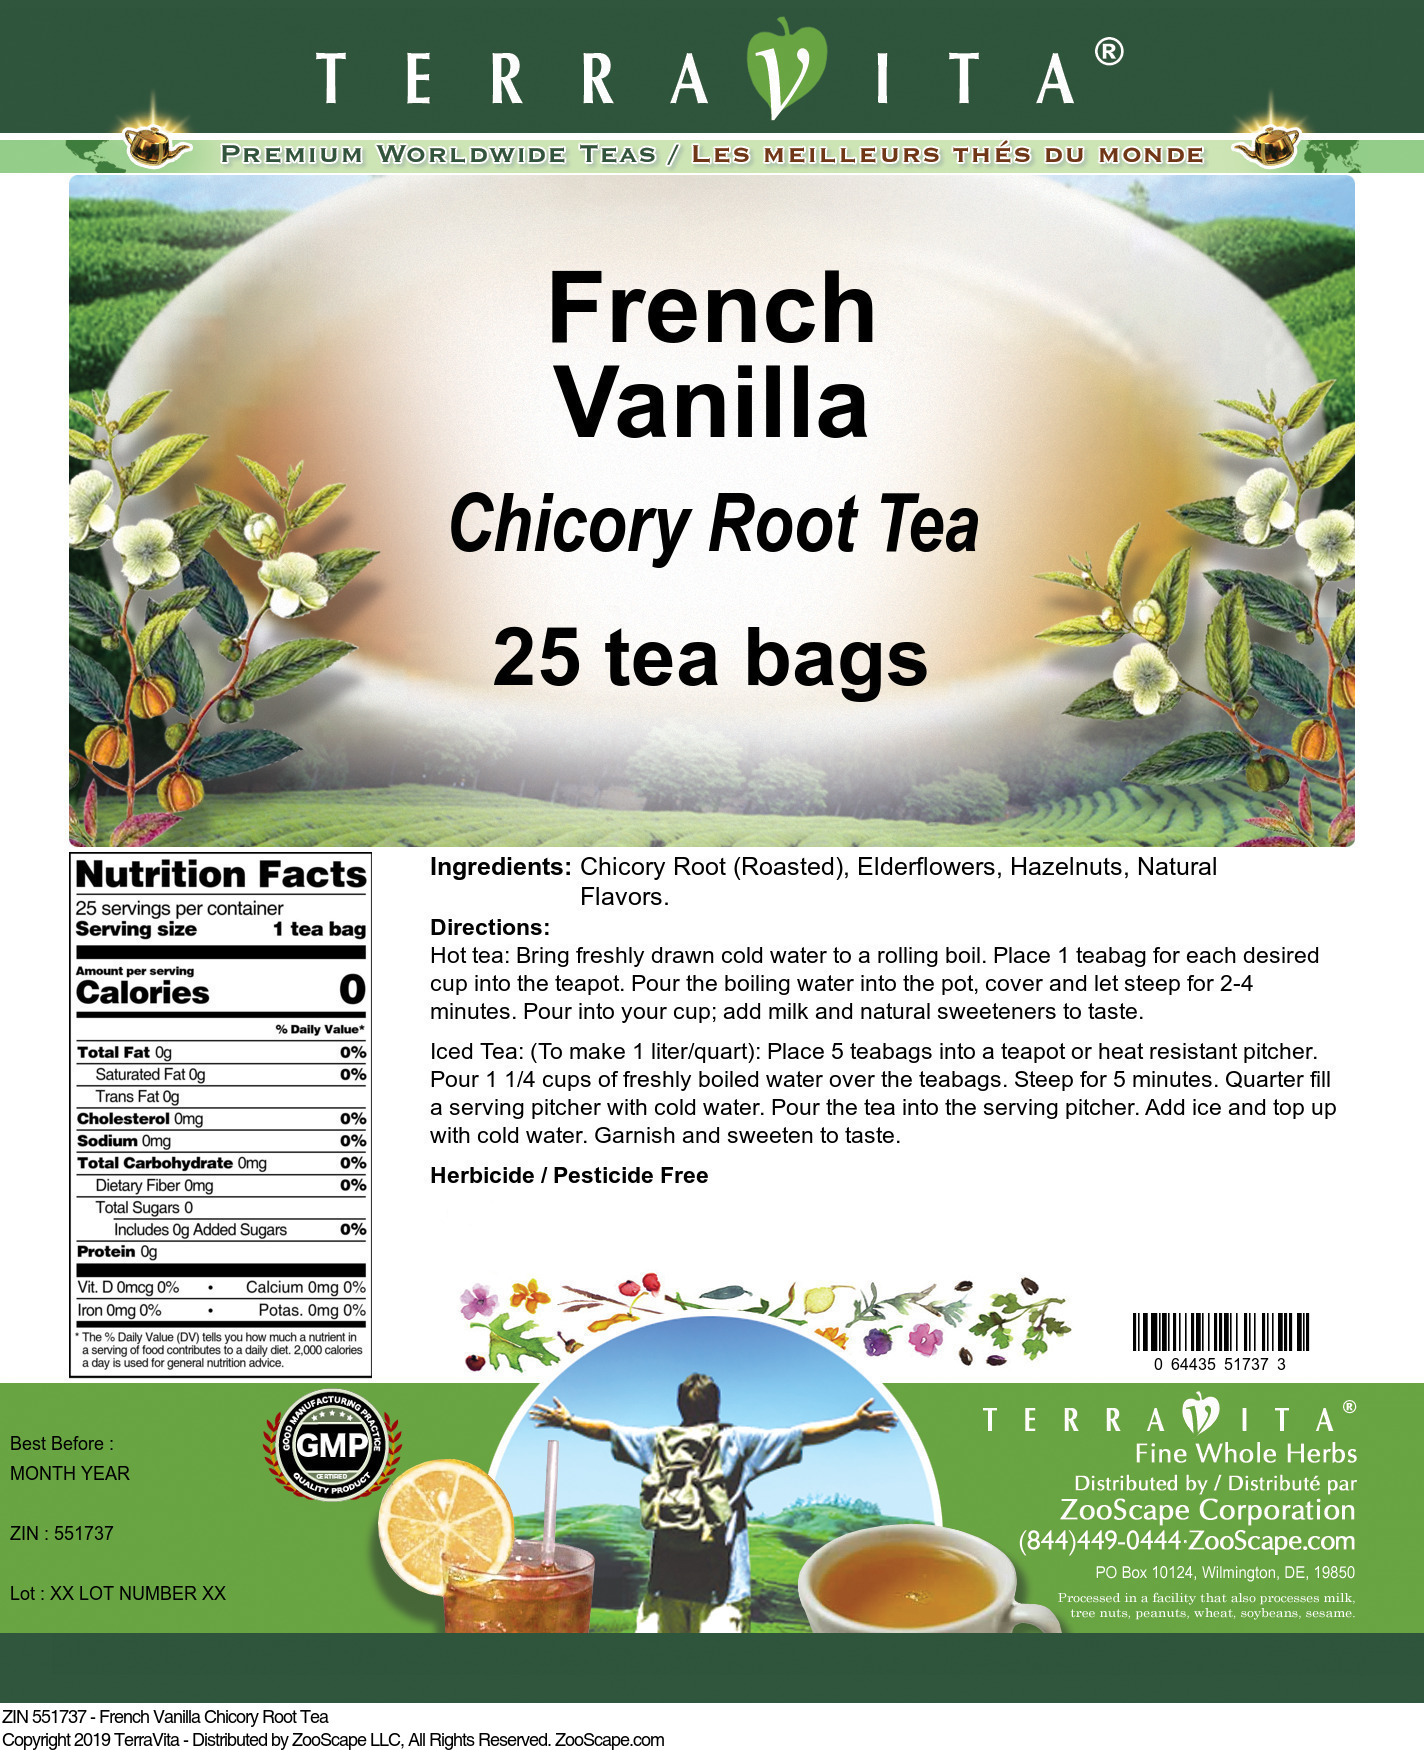 French Vanilla Chicory Root Tea